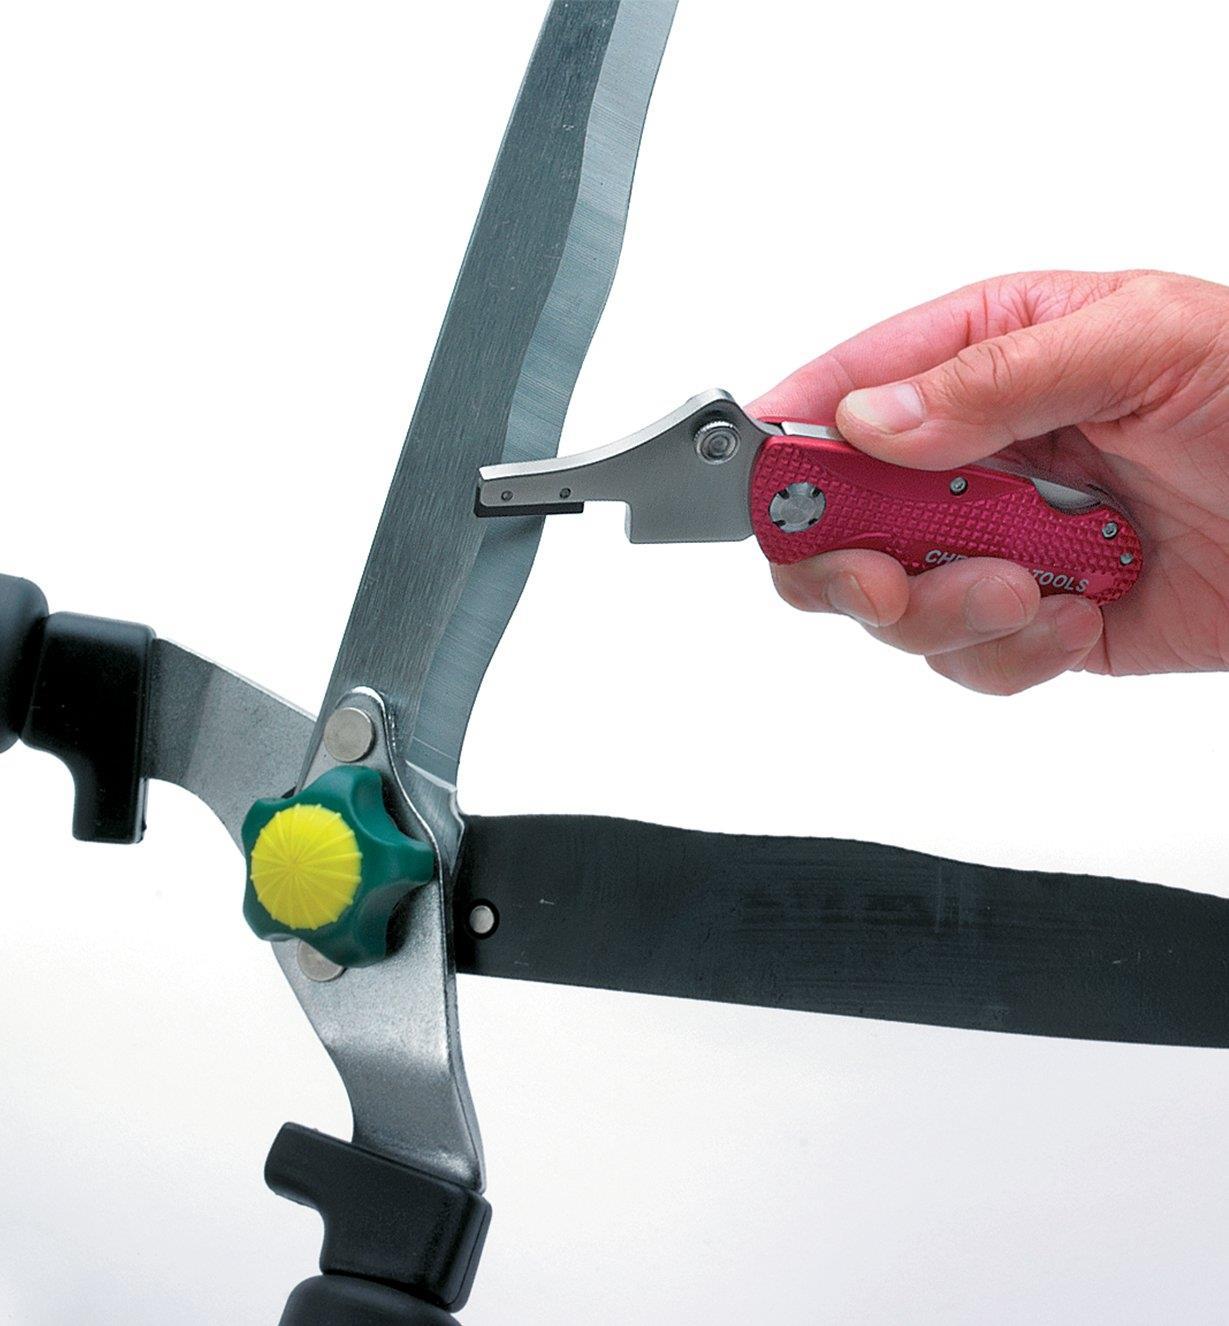 09A0332 - Universal Sharpener